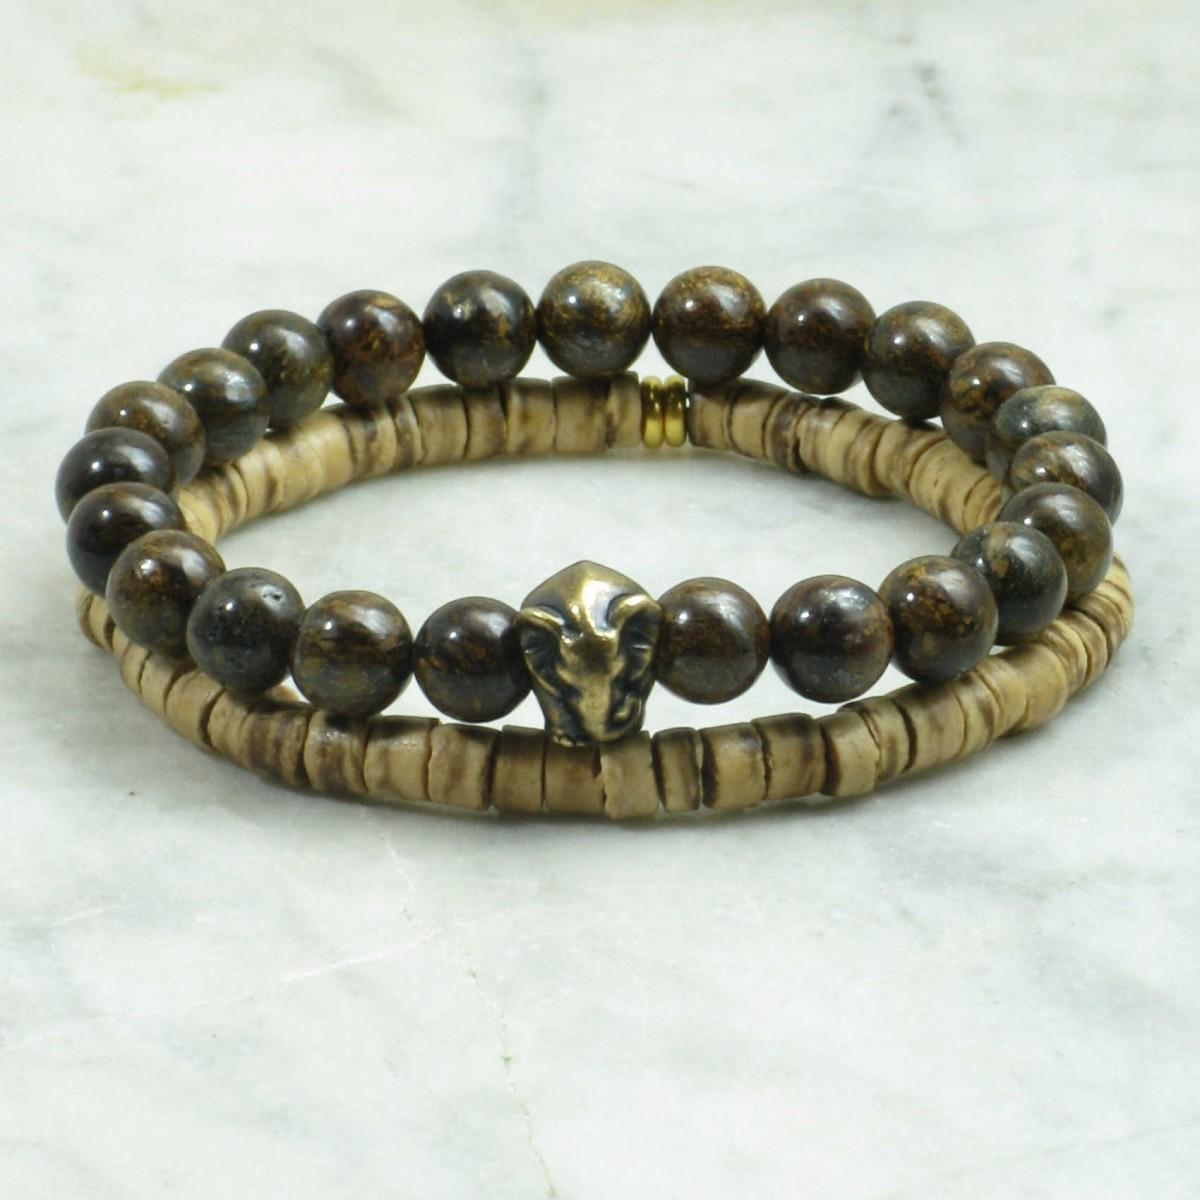 Hemingways_Bracelets_for_Men_Mala_Beads_Stacks_Bronzite_Coconut_Buddhist_Prayer_Beads